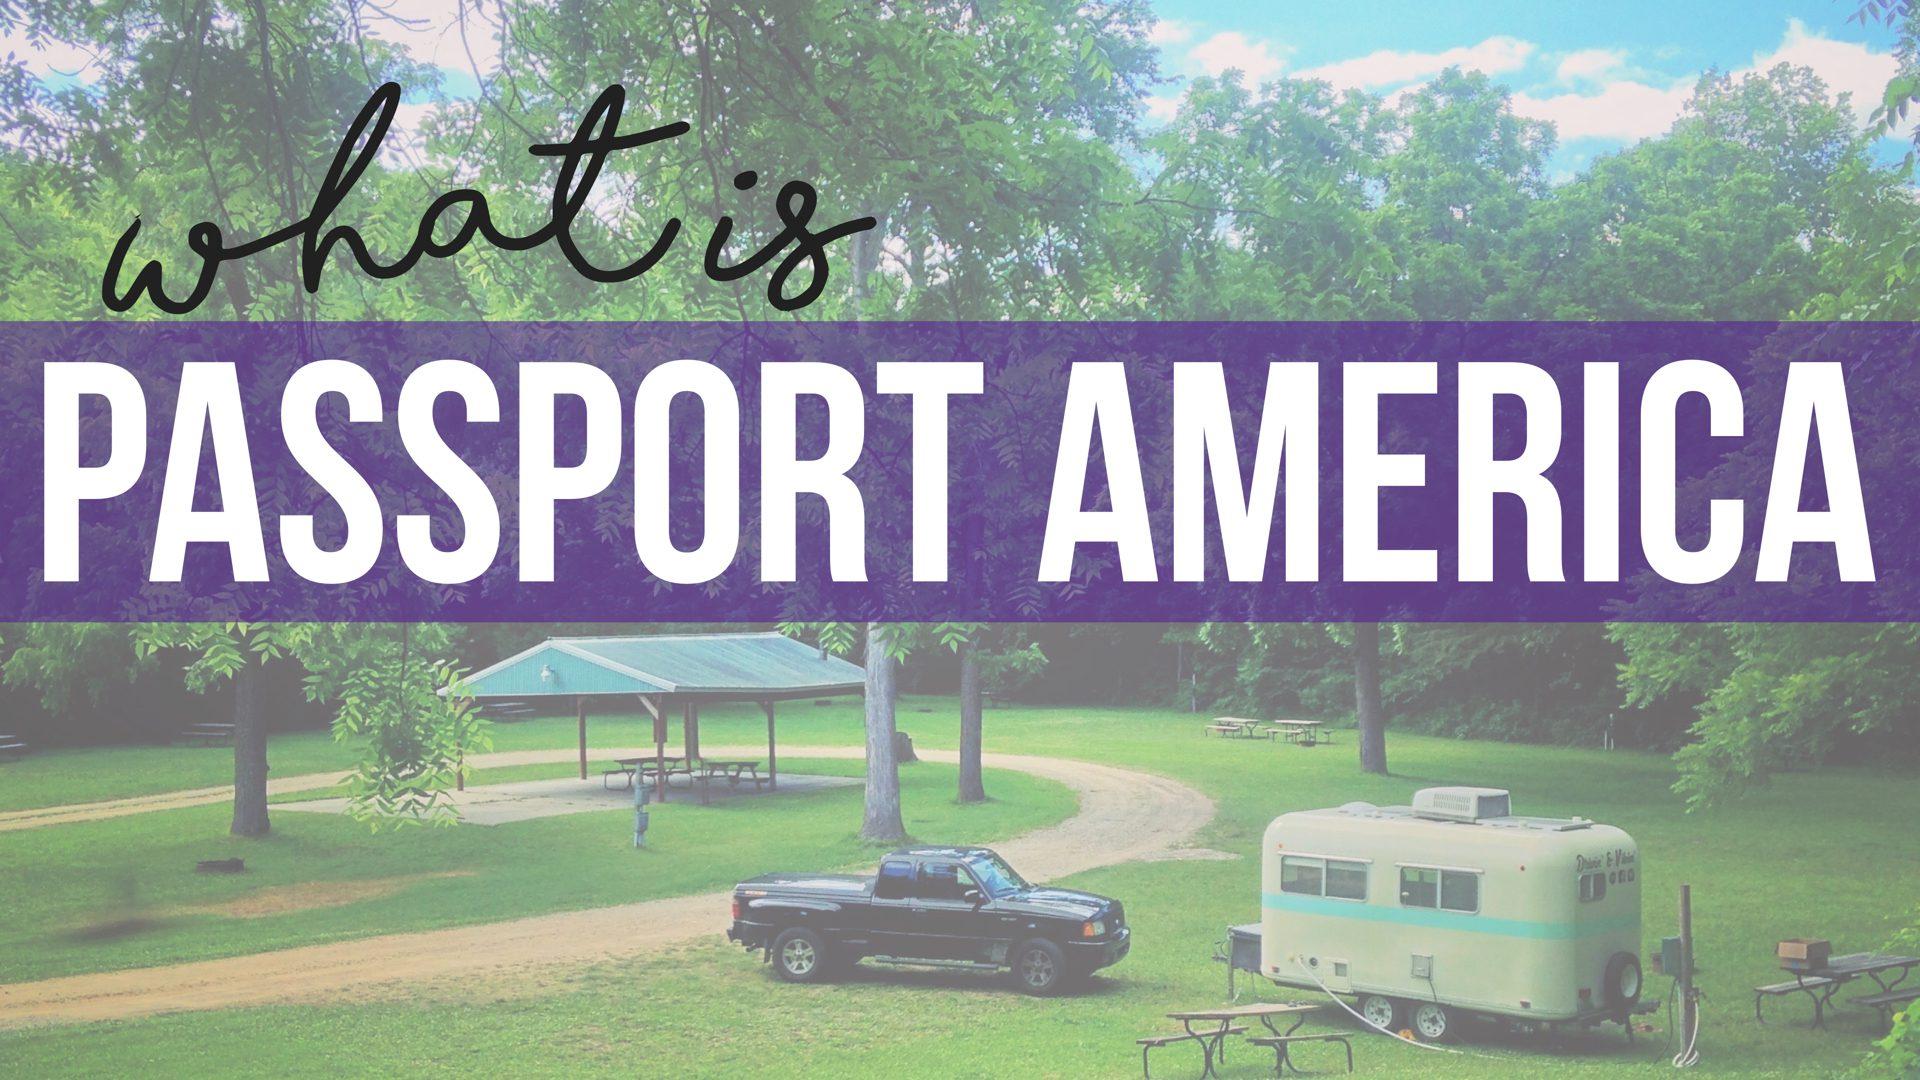 What is Passport America?